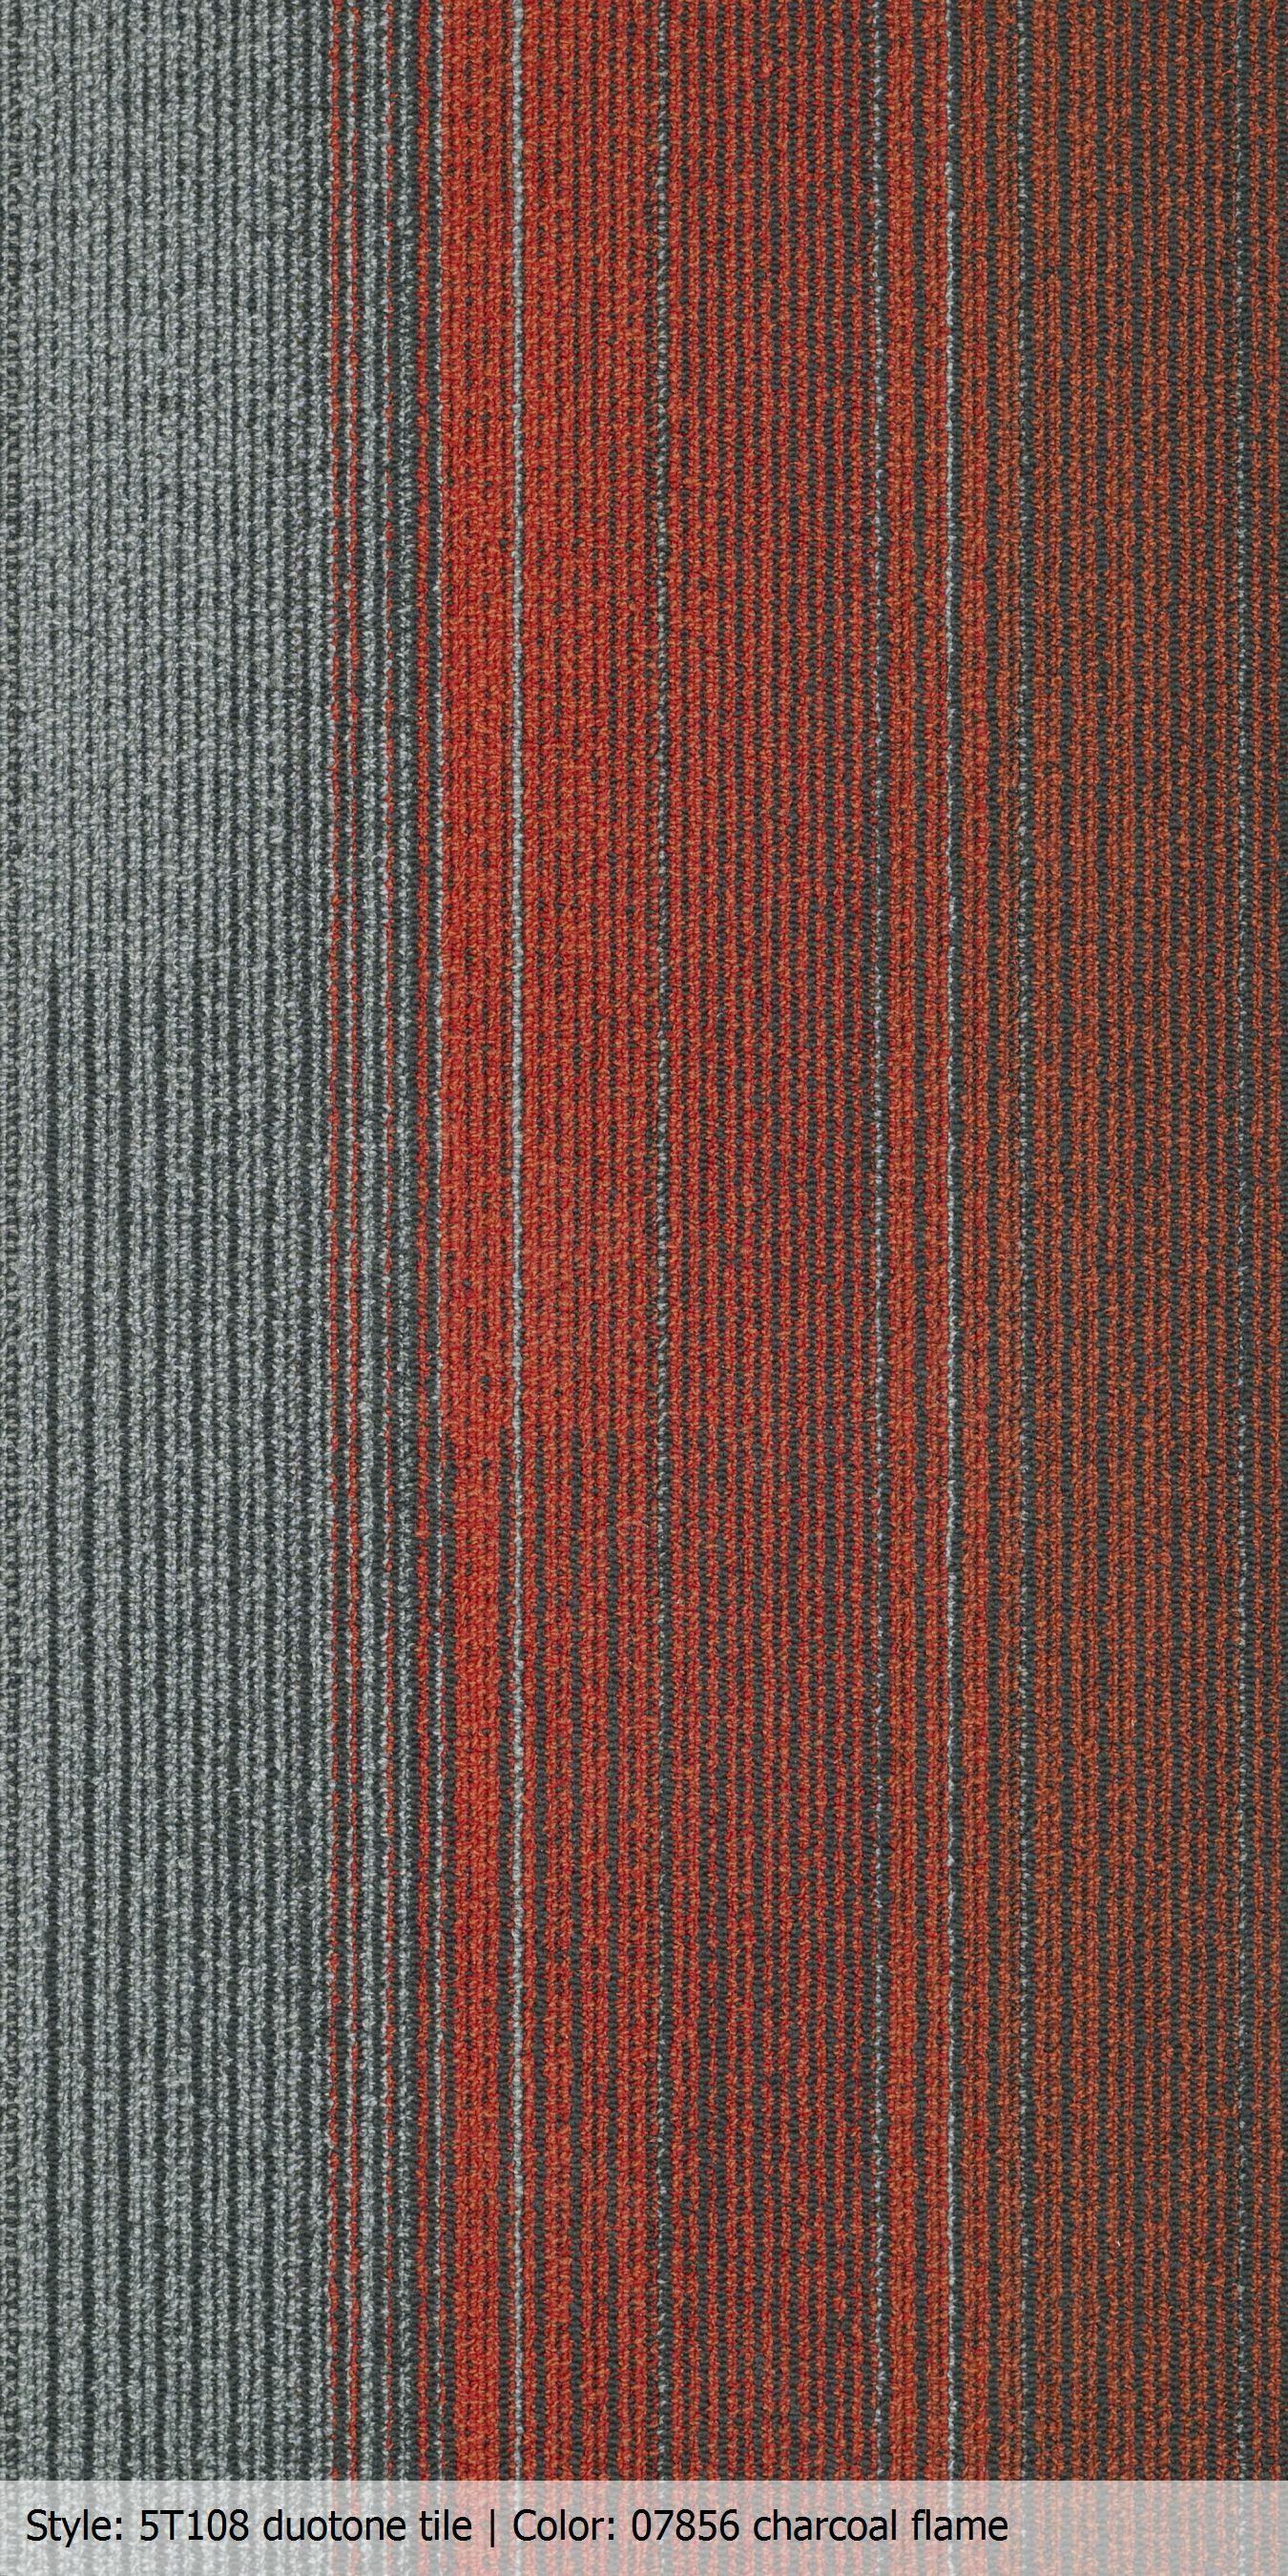 Carpet Tile 18x36 Duotone Color Charcoal Flame Pr Trading